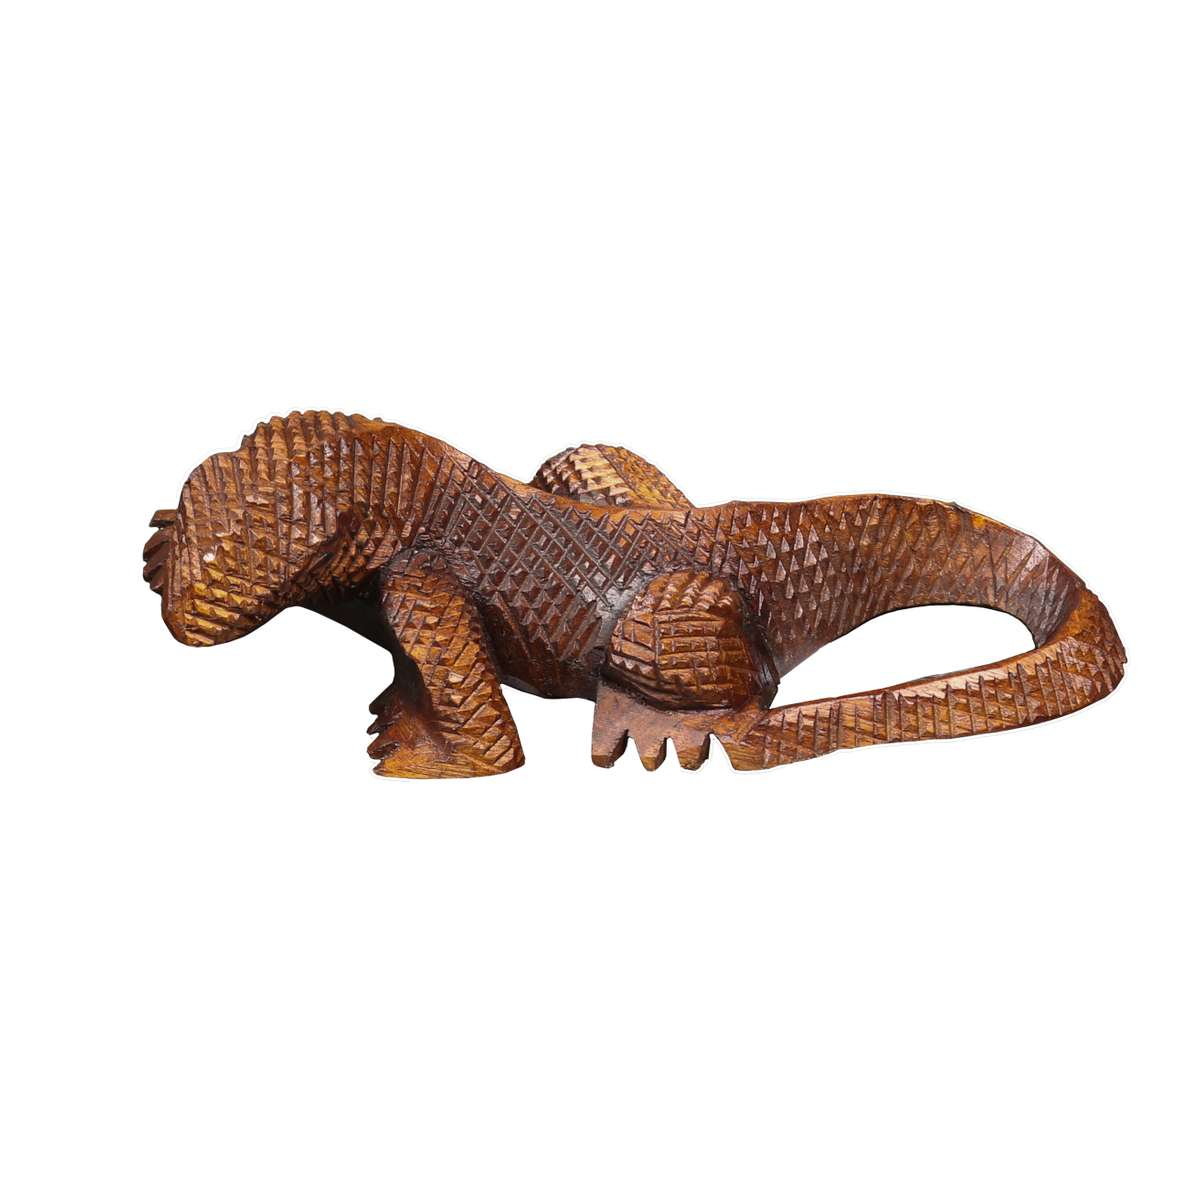 je 31 x 14 cm Home3010 2er Set gro/ße Eidechse Gecko Salamander *Drache gr/ün* Kunstharz